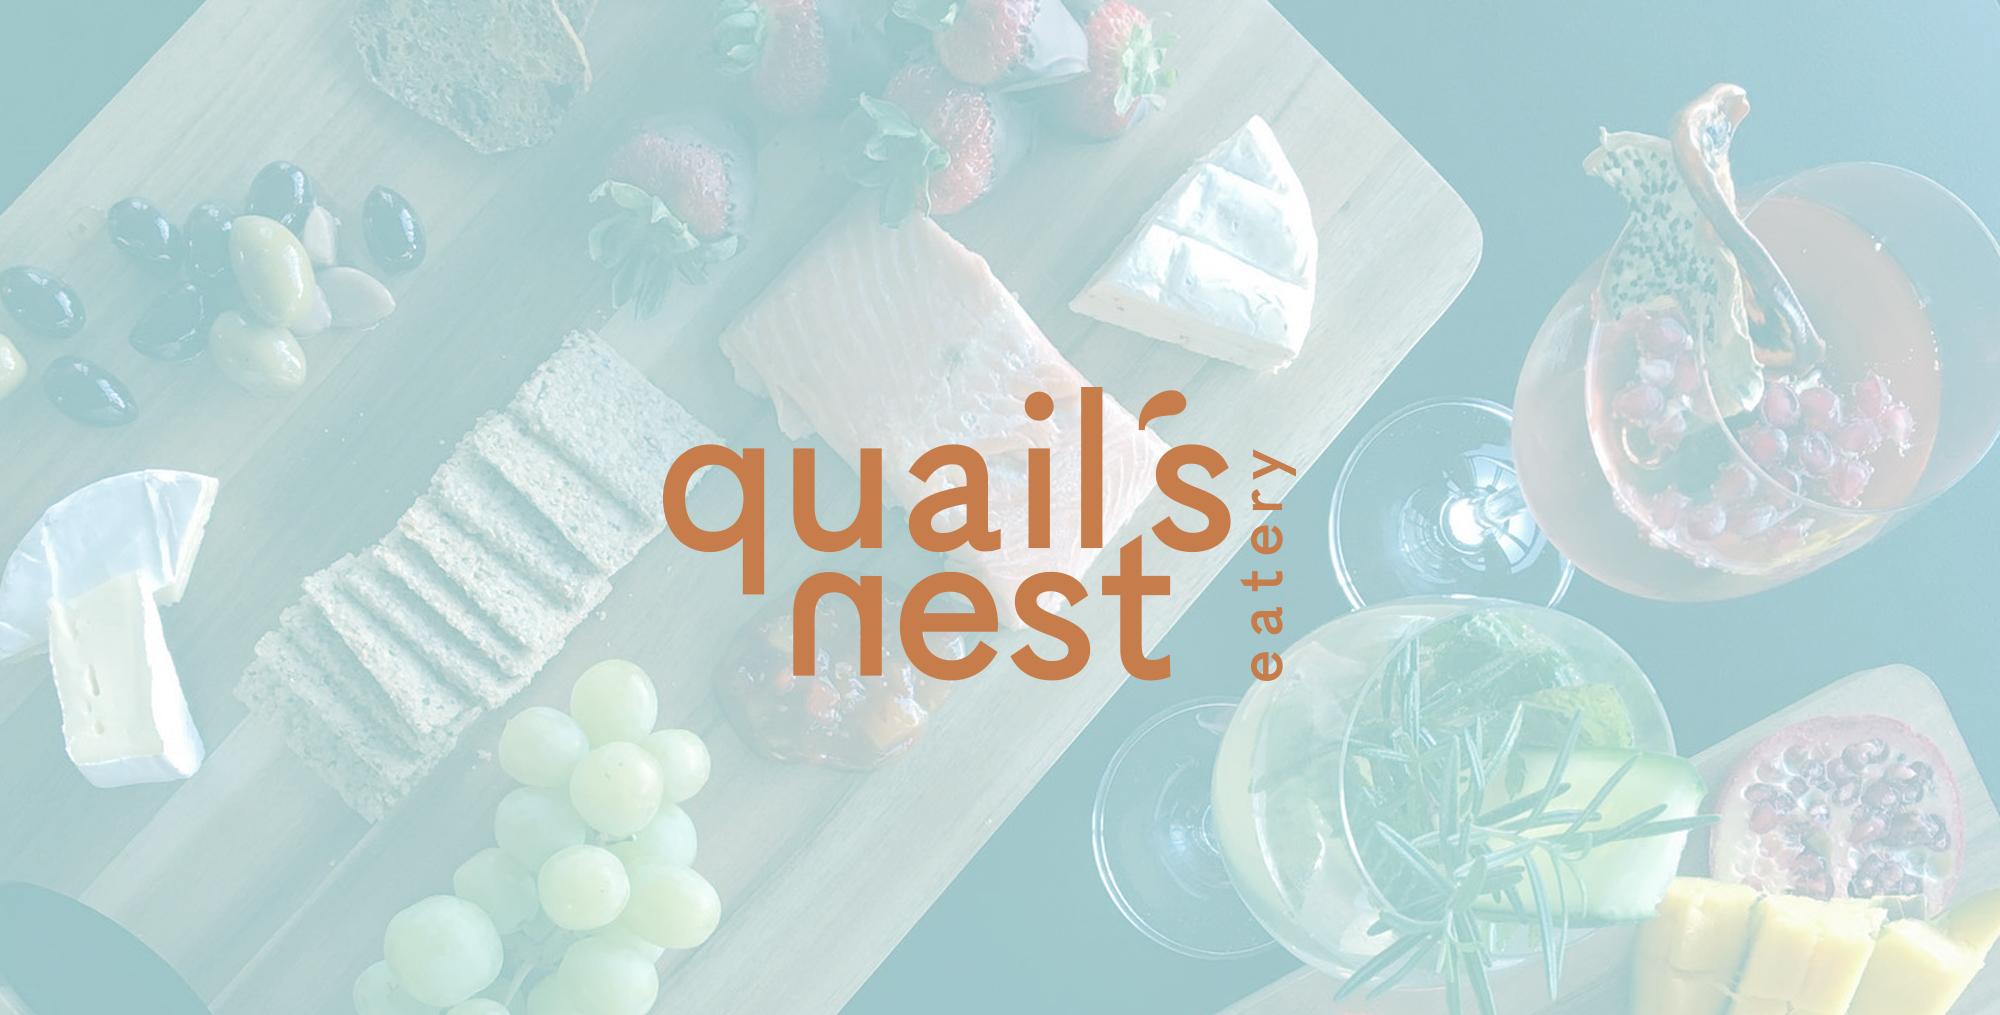 Quails Nest Eatery